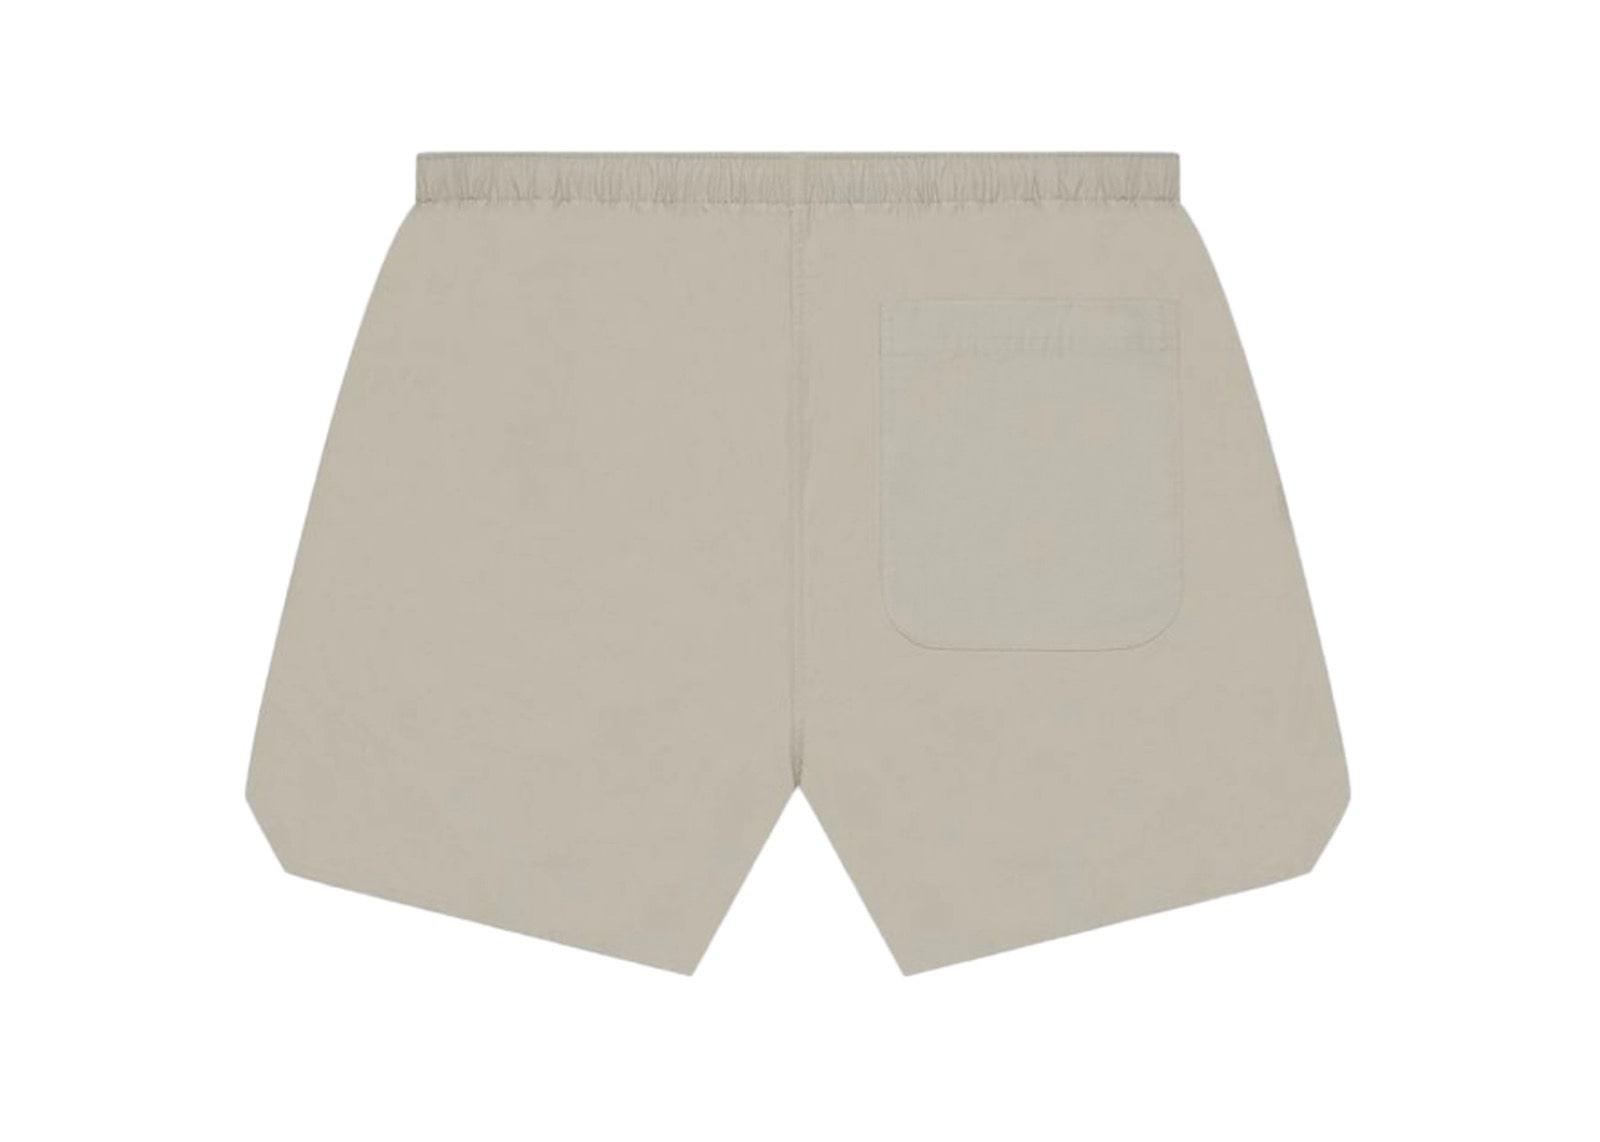 slide 2 - Moss Volley Shorts